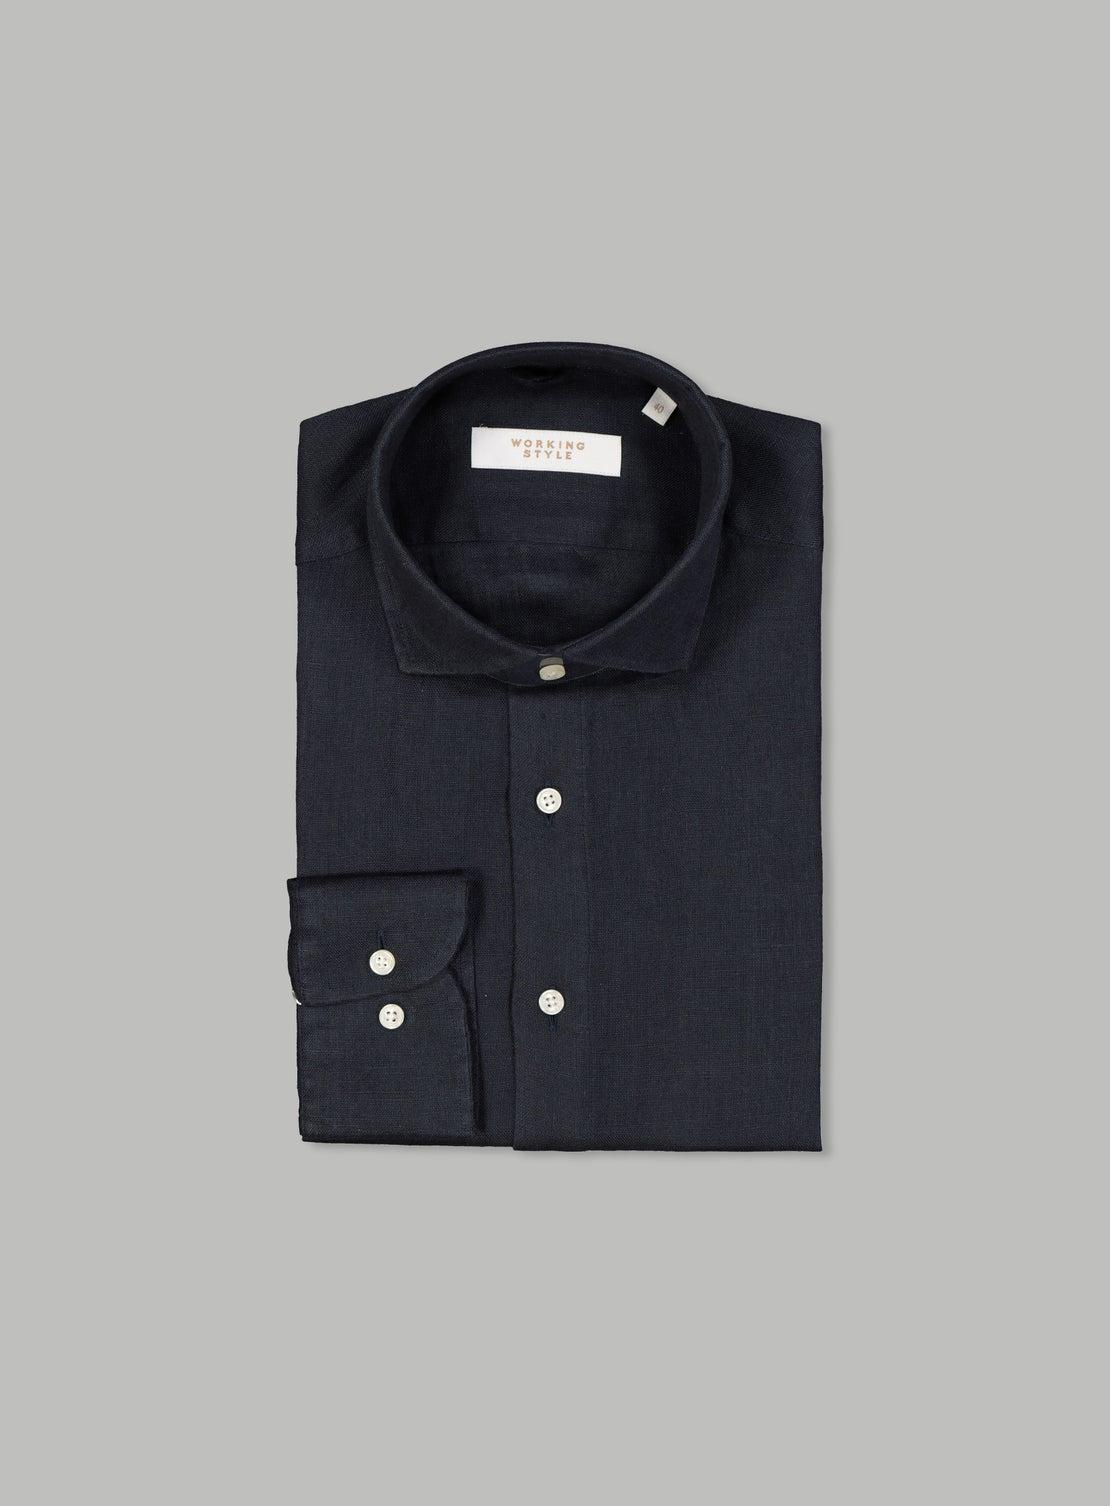 Agostino Navy Linen Shirt